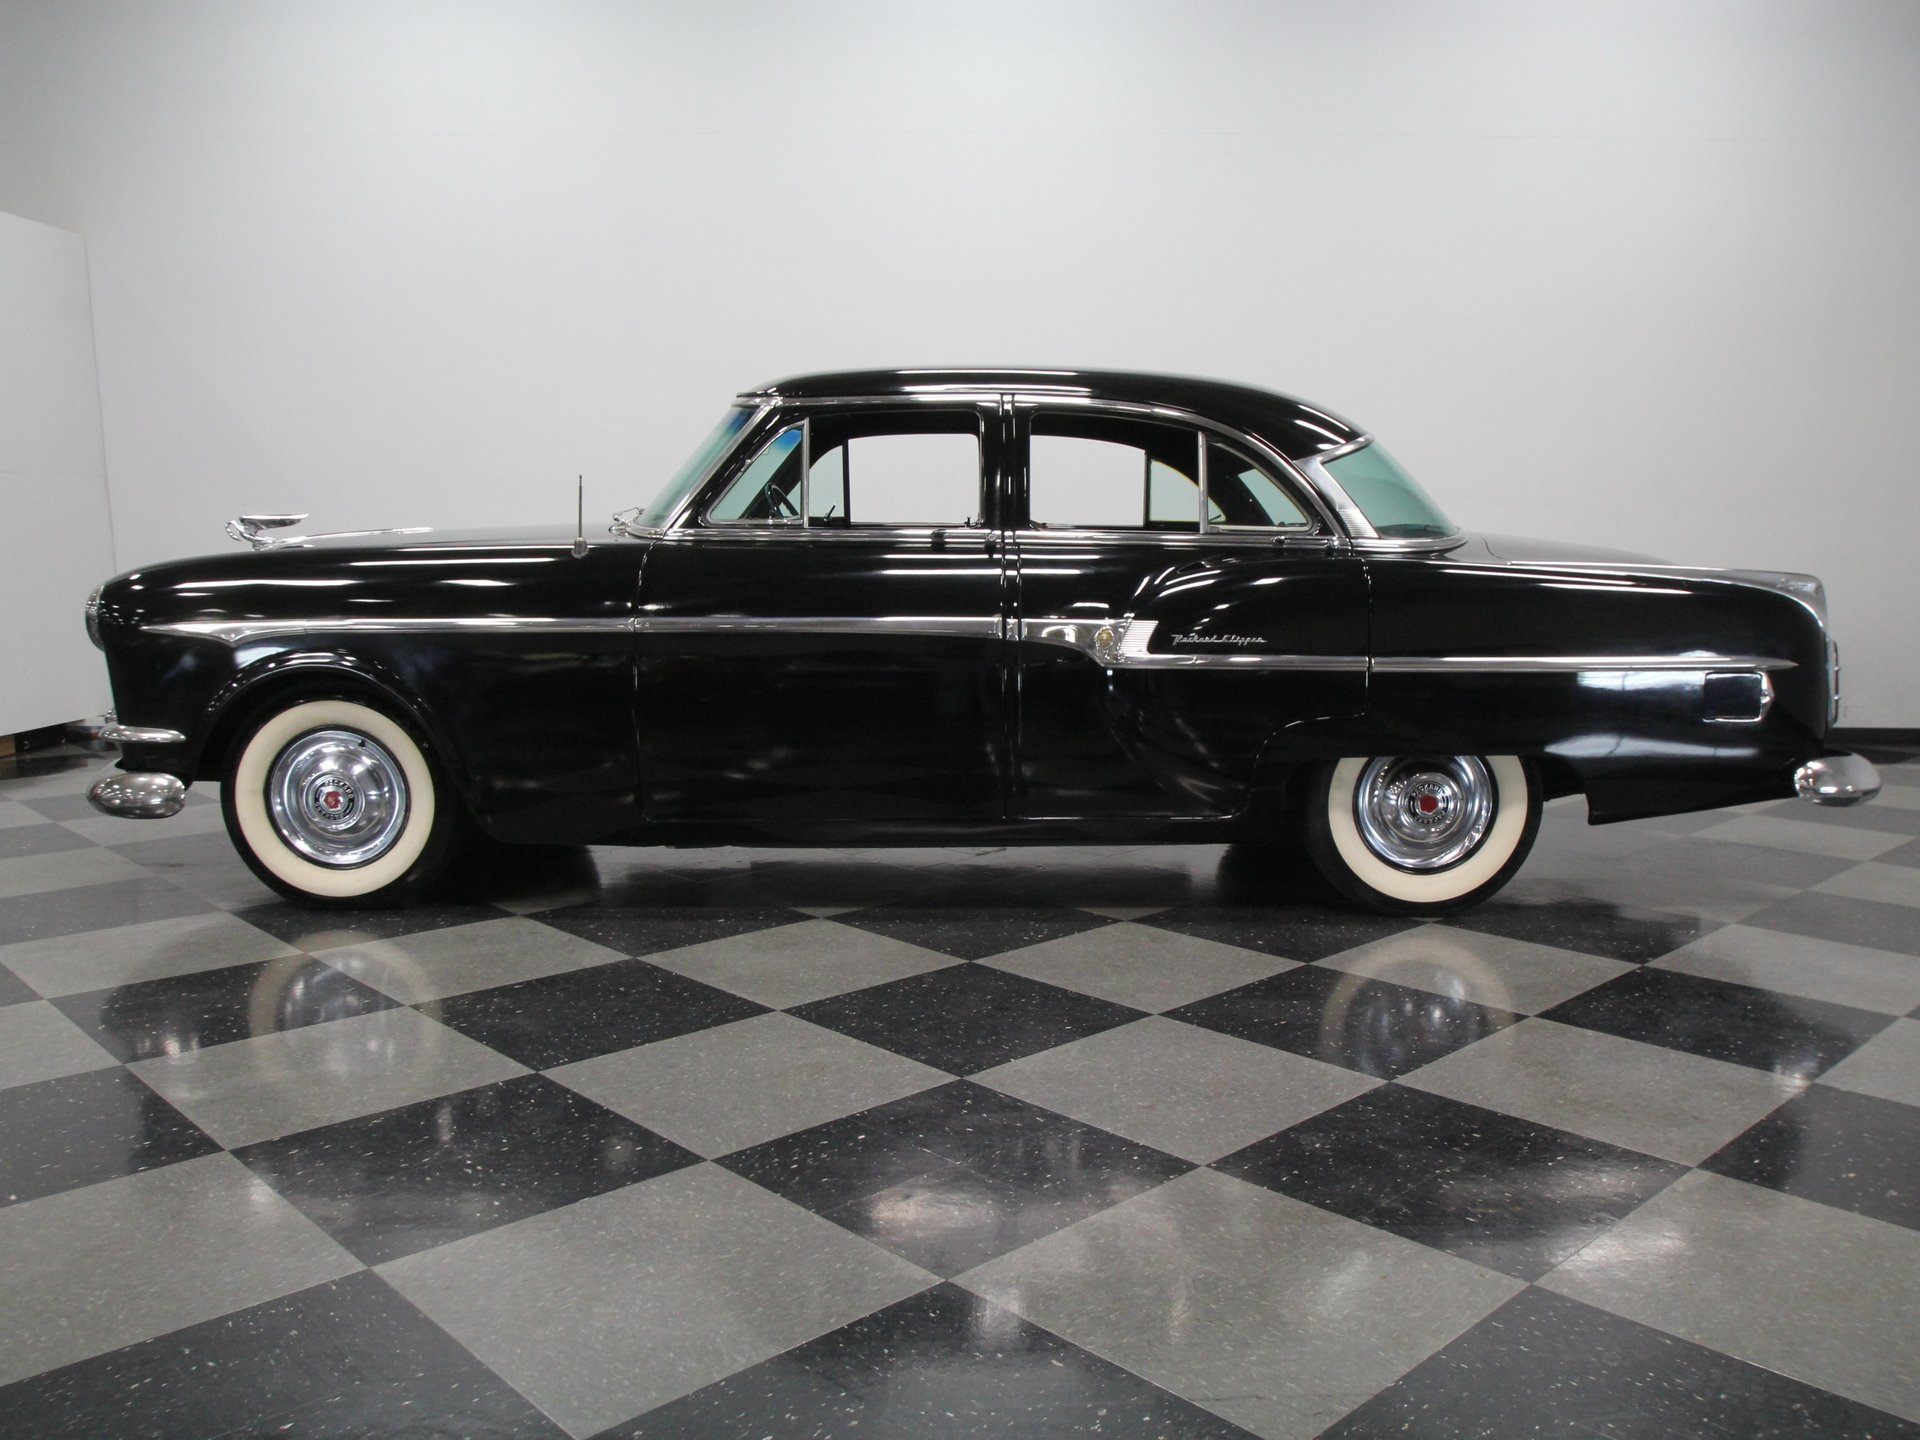 1953 packard clipper touring sedan